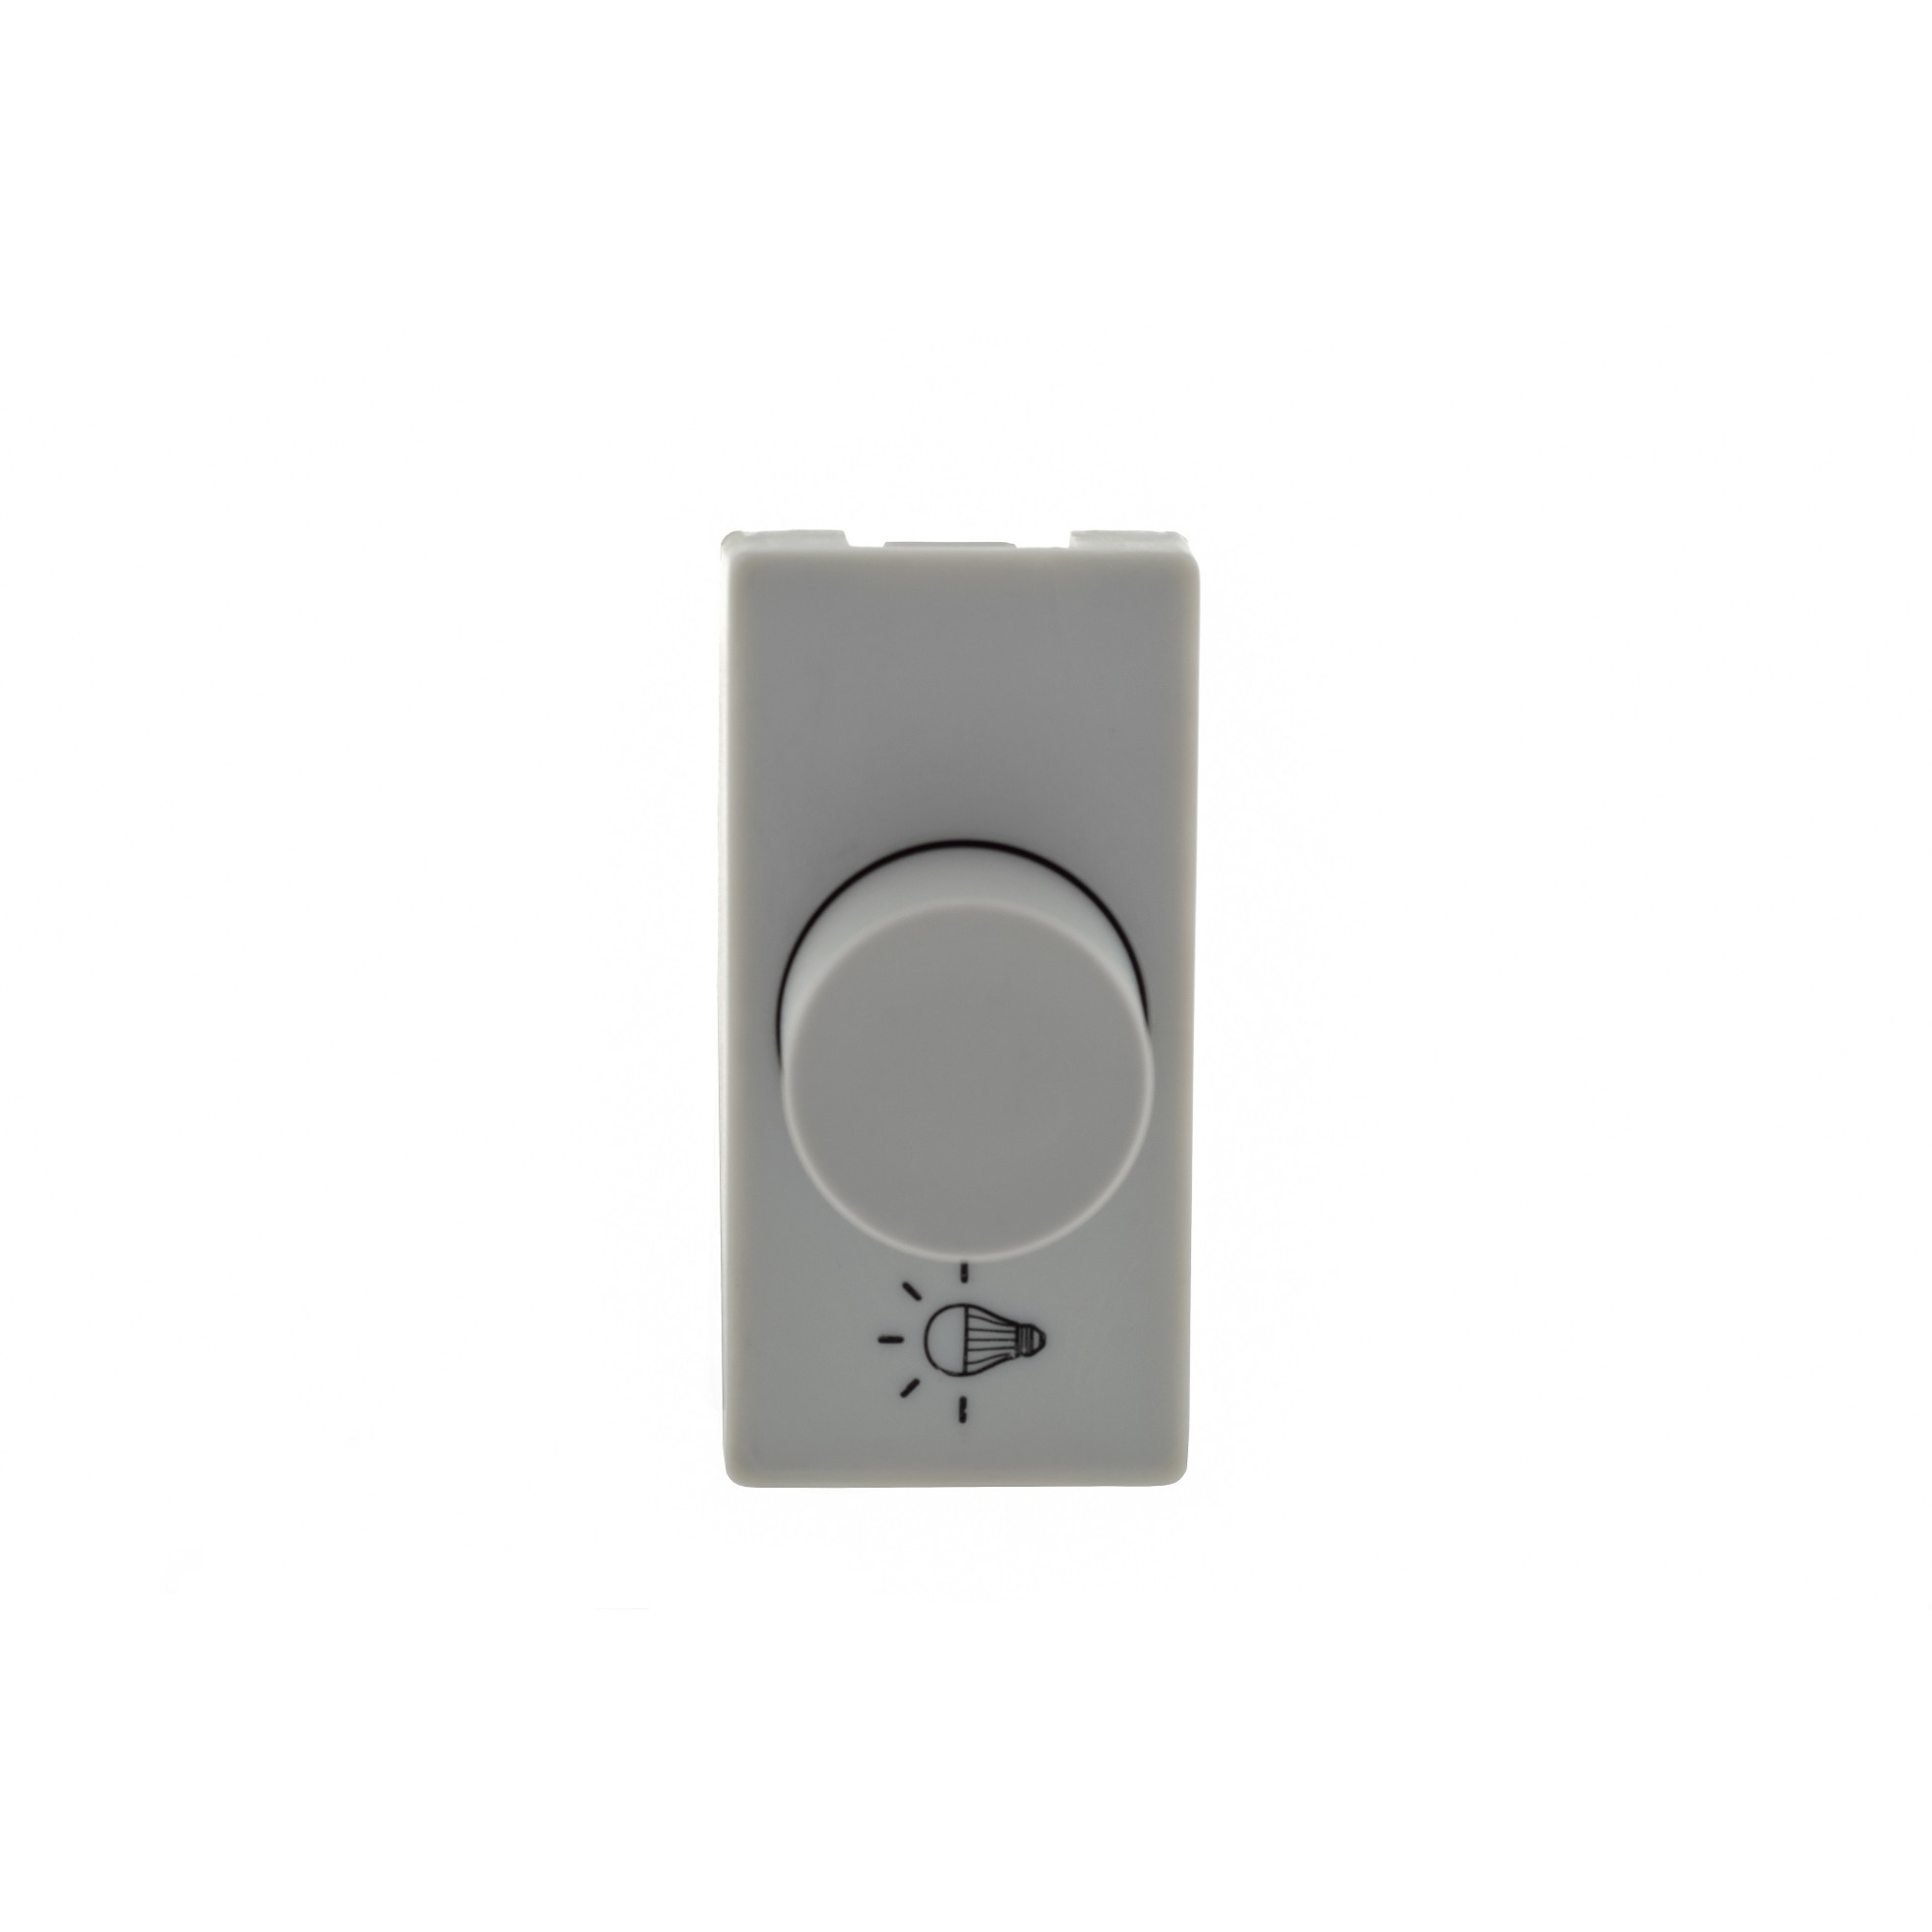 Variador de Luminosidade Rotativo Modular de Embutir Bivolt Cinza Plus - Legrand